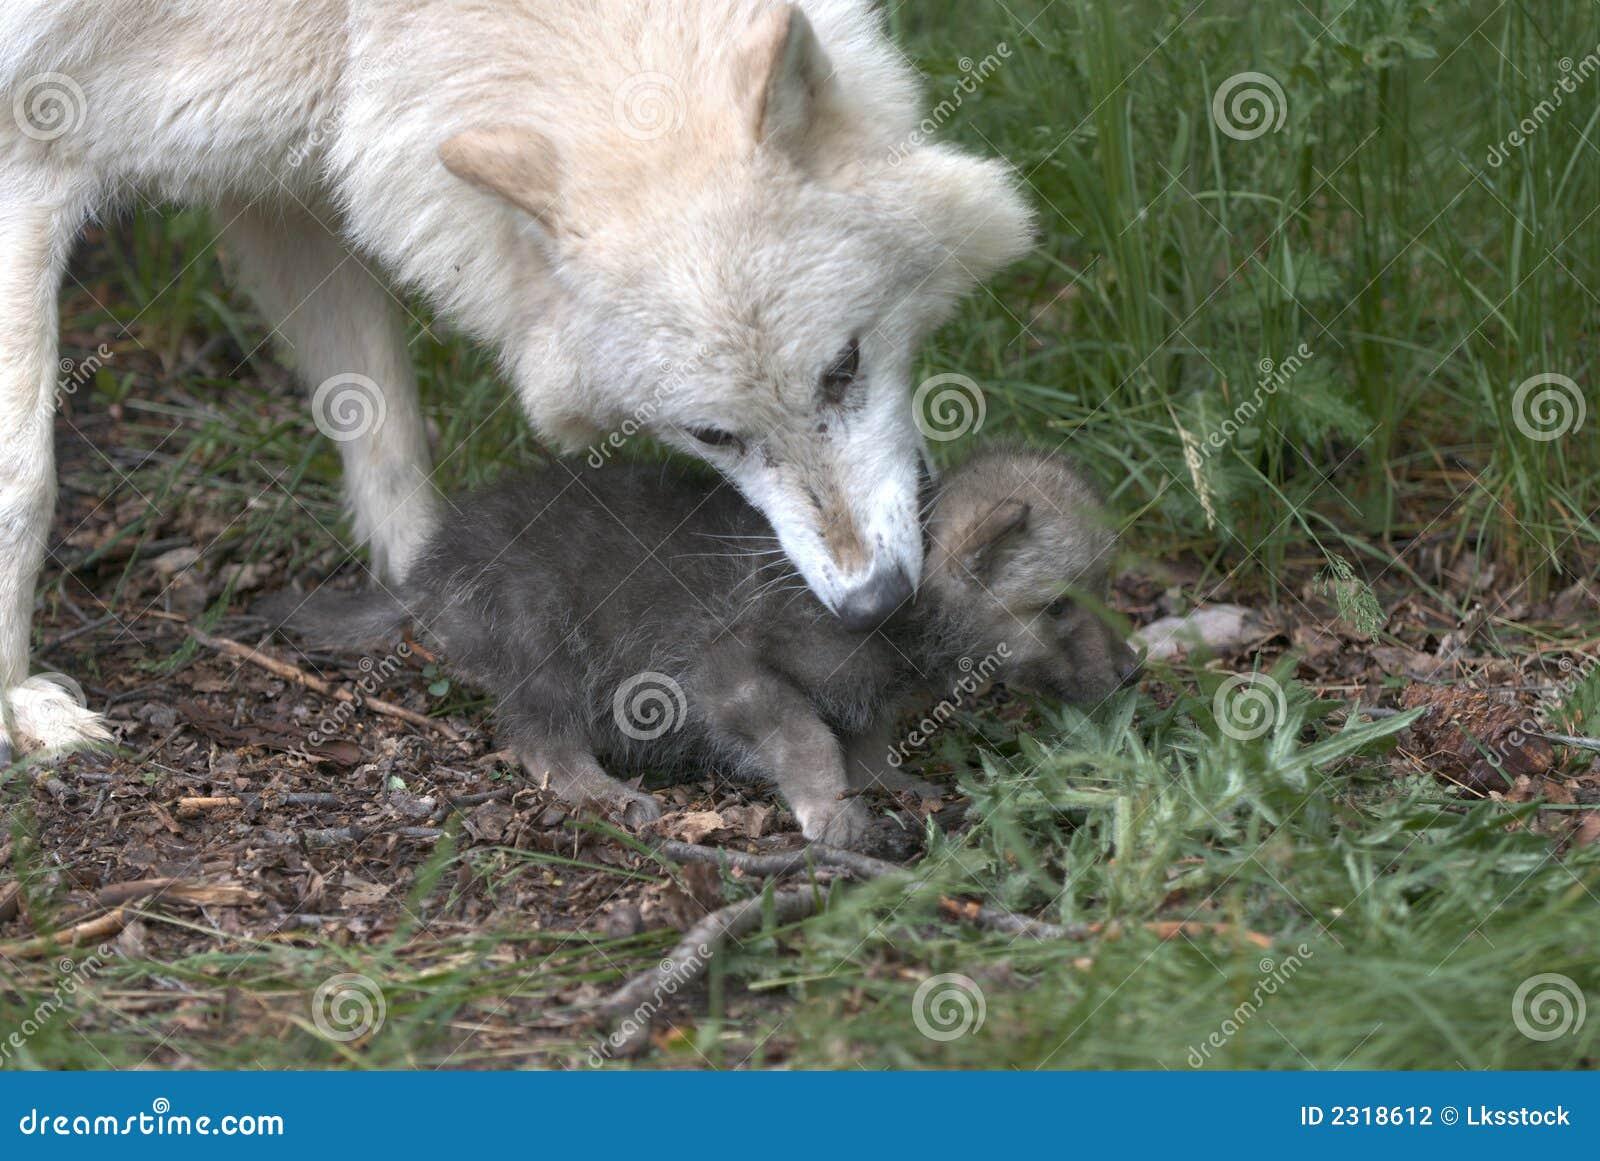 Fotos de perros rottweiler cachorros 97